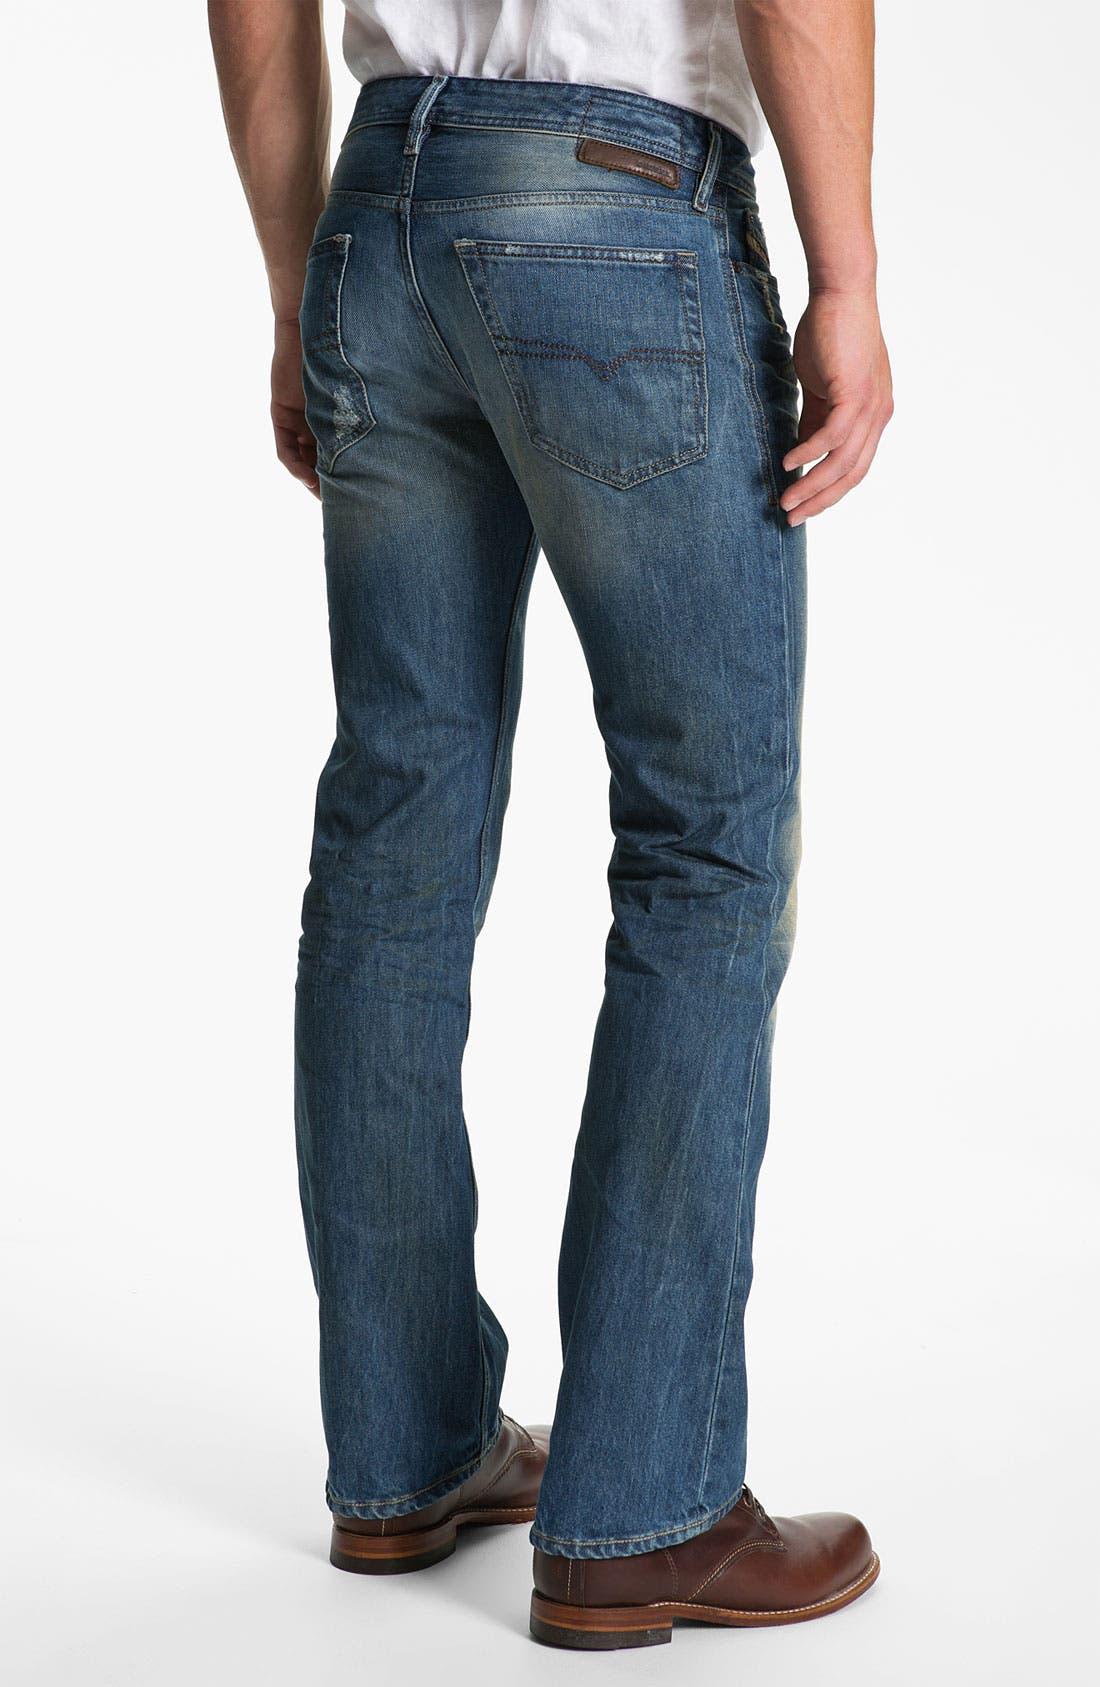 Alternate Image 1 Selected - DIESEL® 'New Fanker' Slim Bootcut Jeans (0075I)